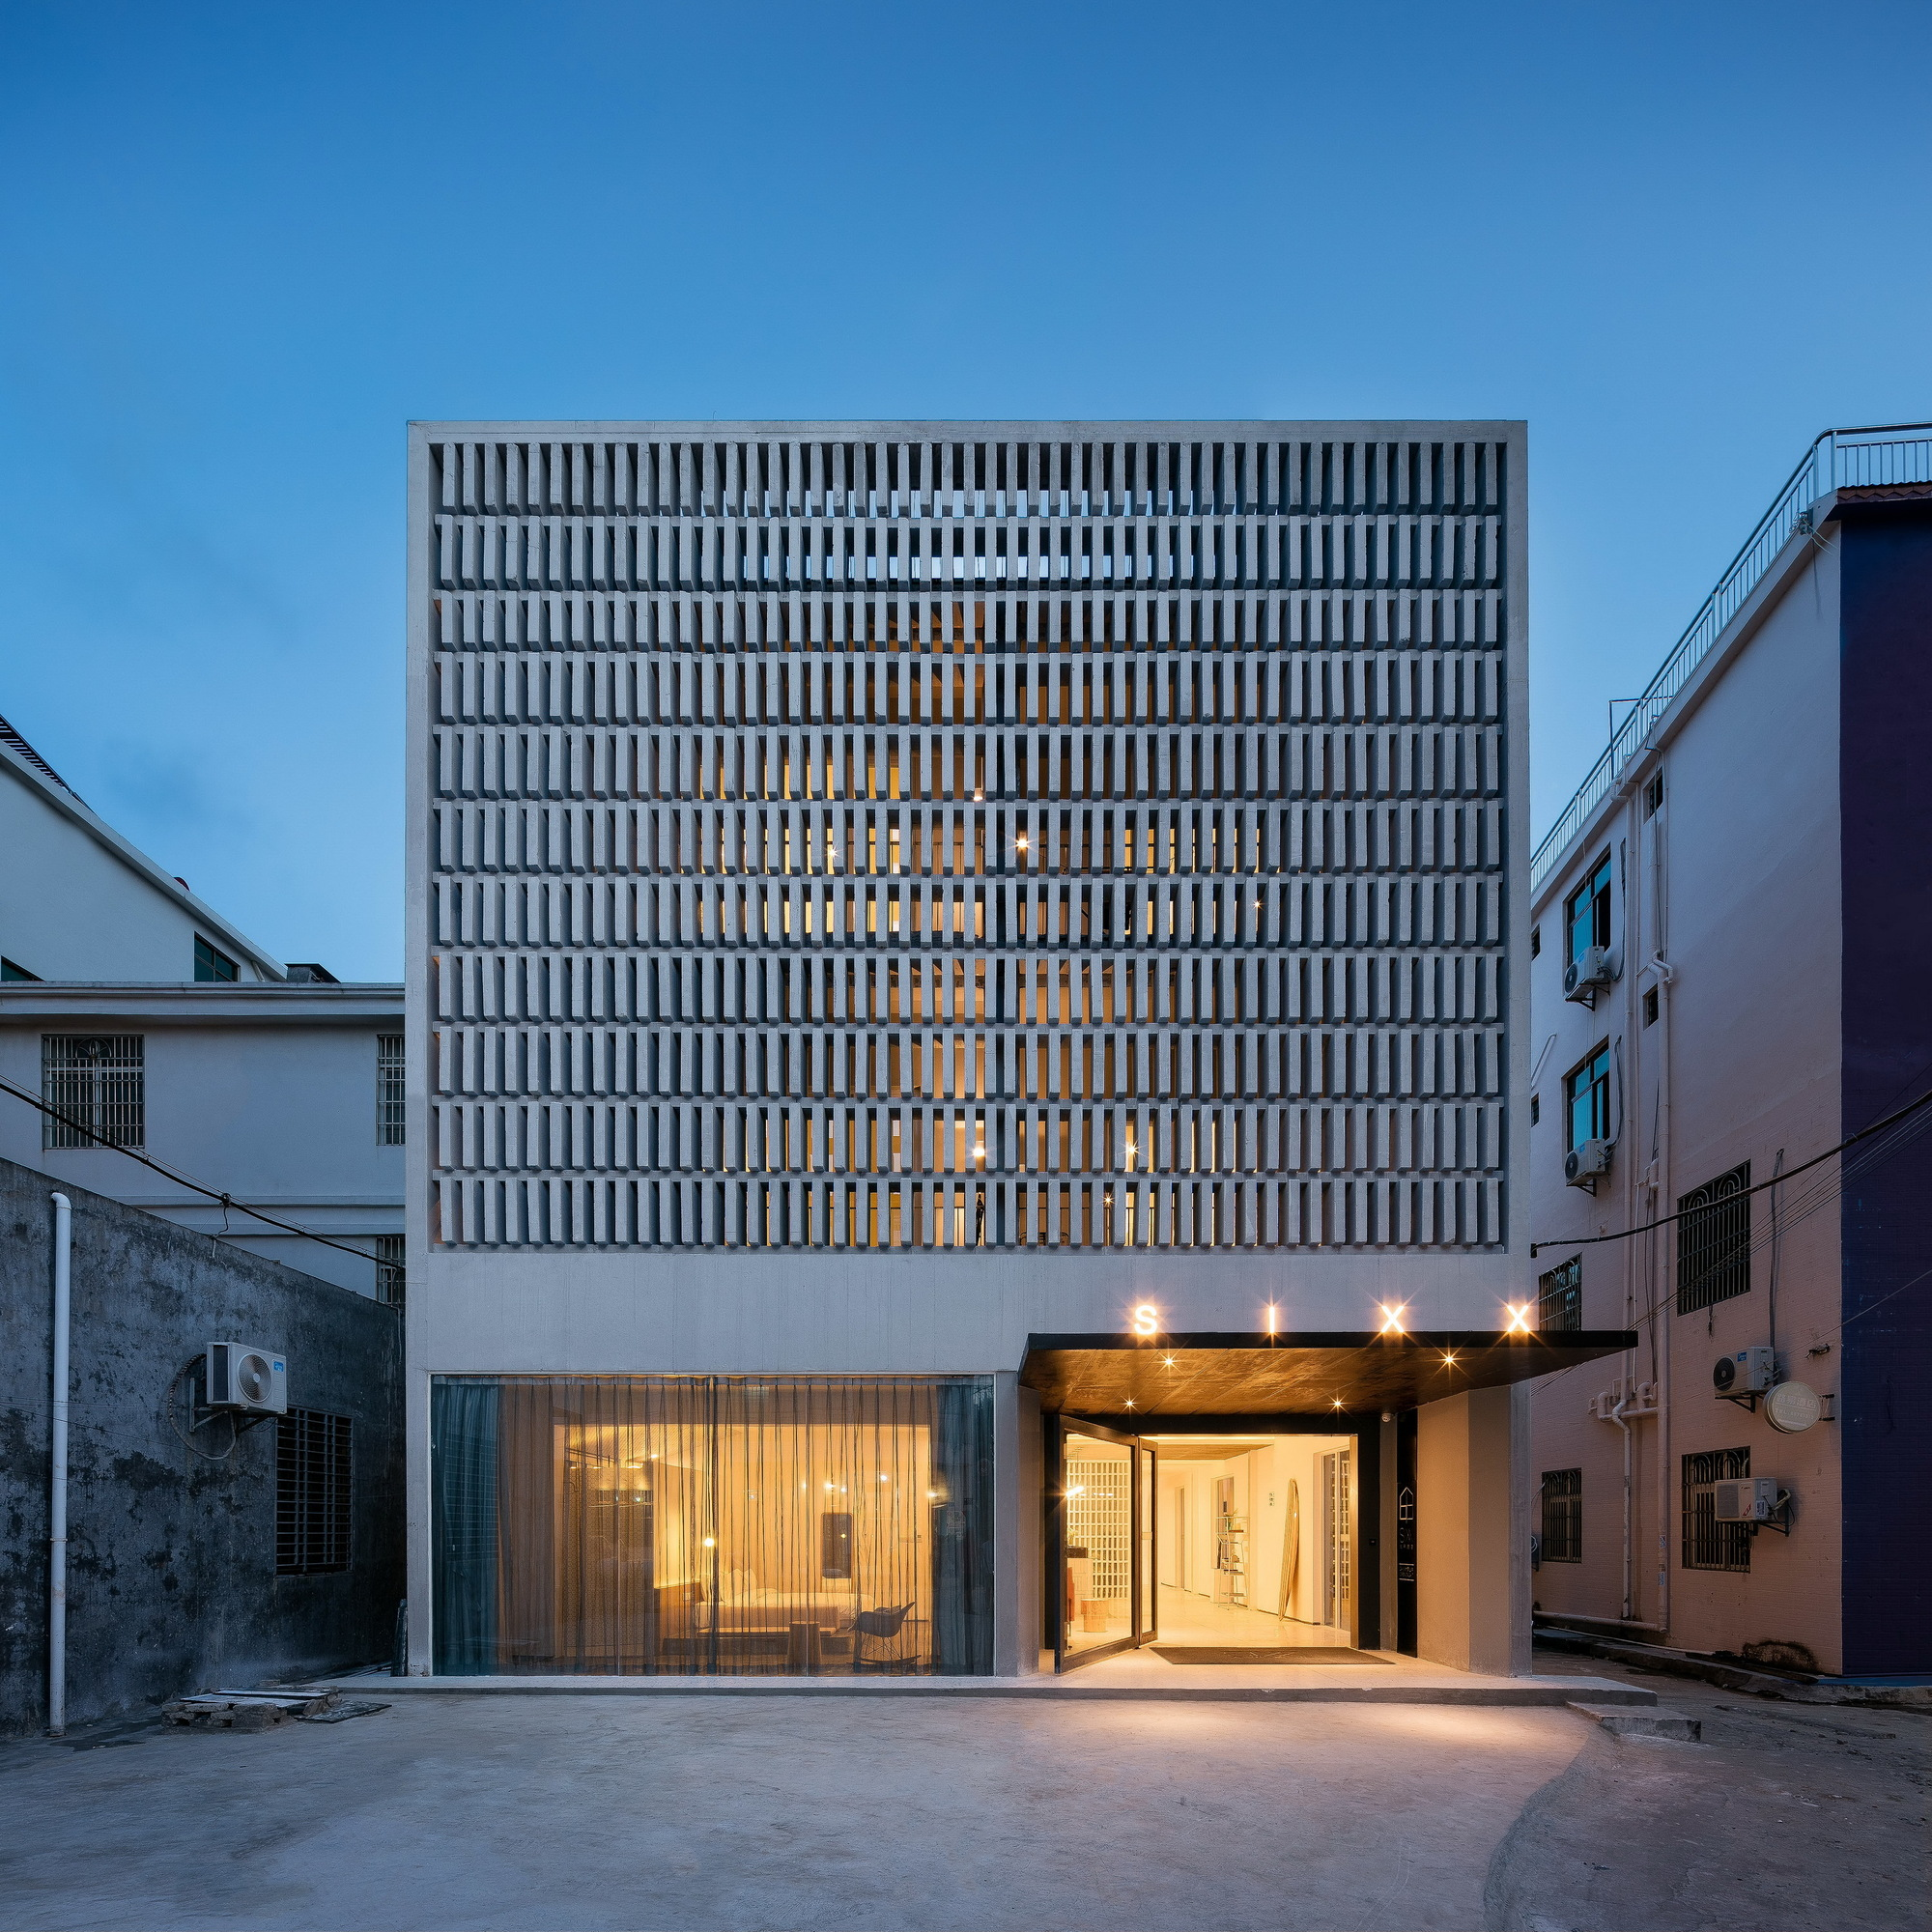 Hotel Exterior Design Architecture Affordable Ideas Modern: Sanya SIXX Hotel / MODULO Architects